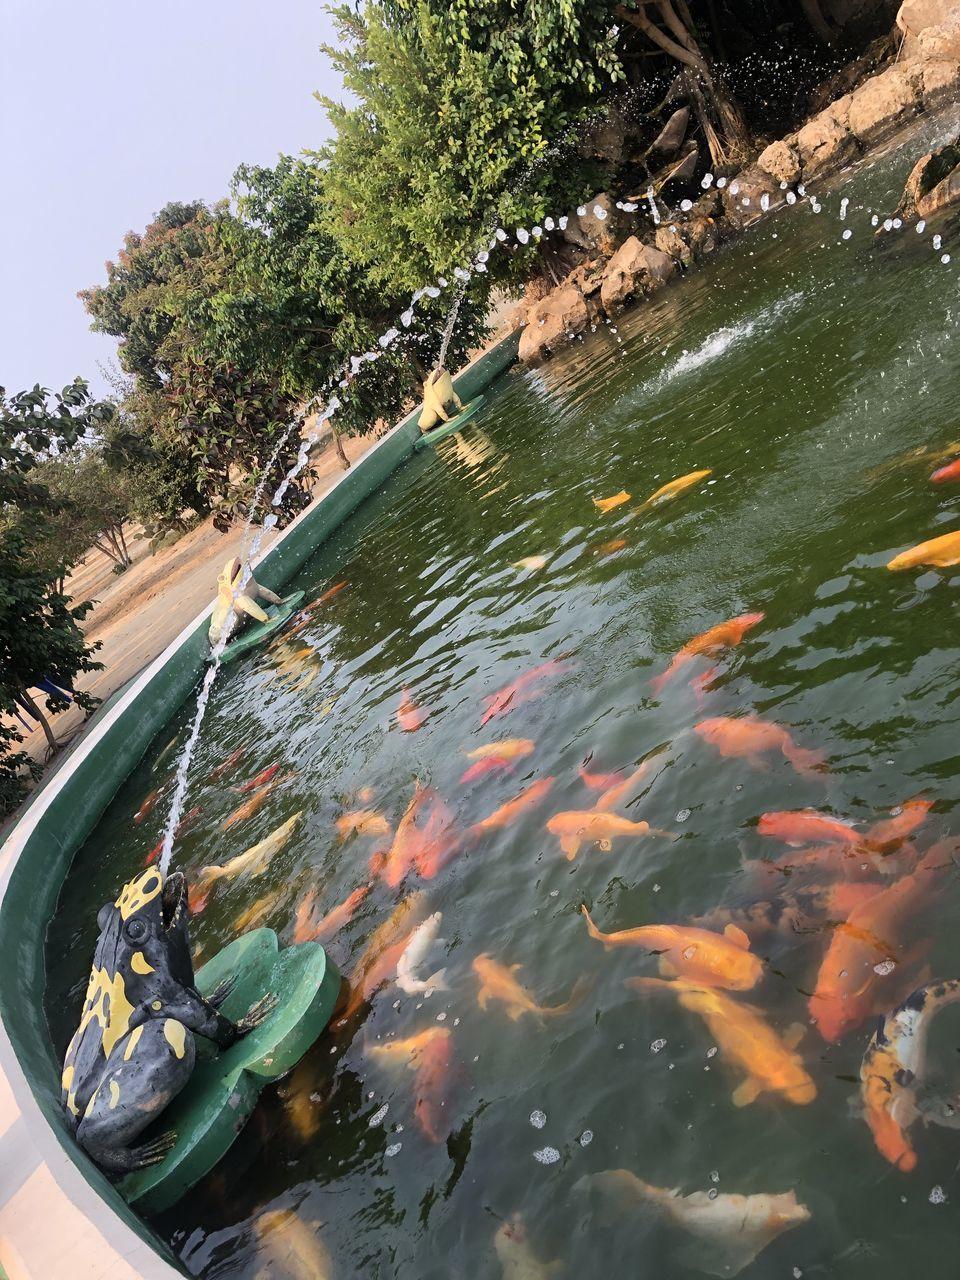 HIGH ANGLE VIEW OF KOI FISH SWIMMING IN LAKE